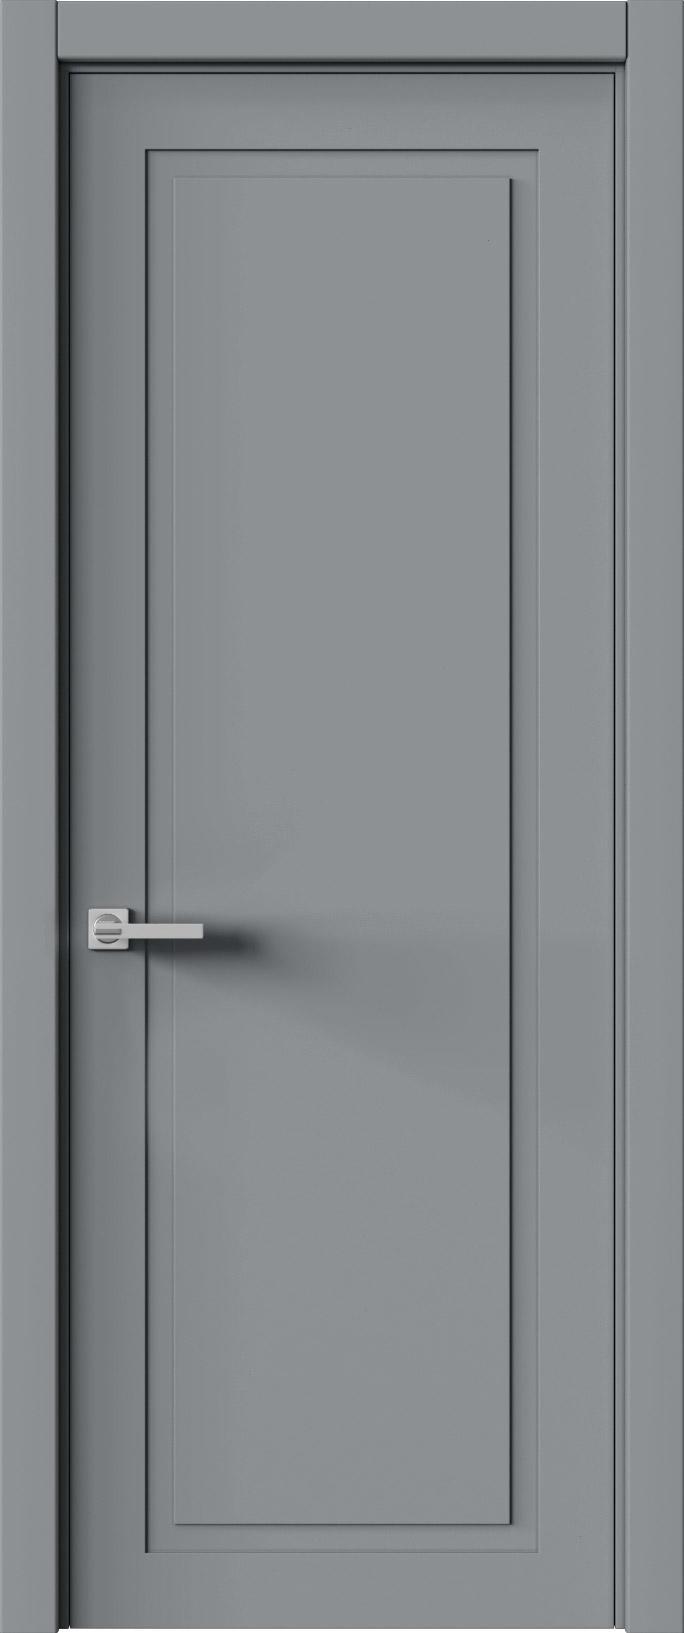 Tivoli Д-5 цвет - Серебристо-серая эмаль (RAL 7045) Без стекла (ДГ)